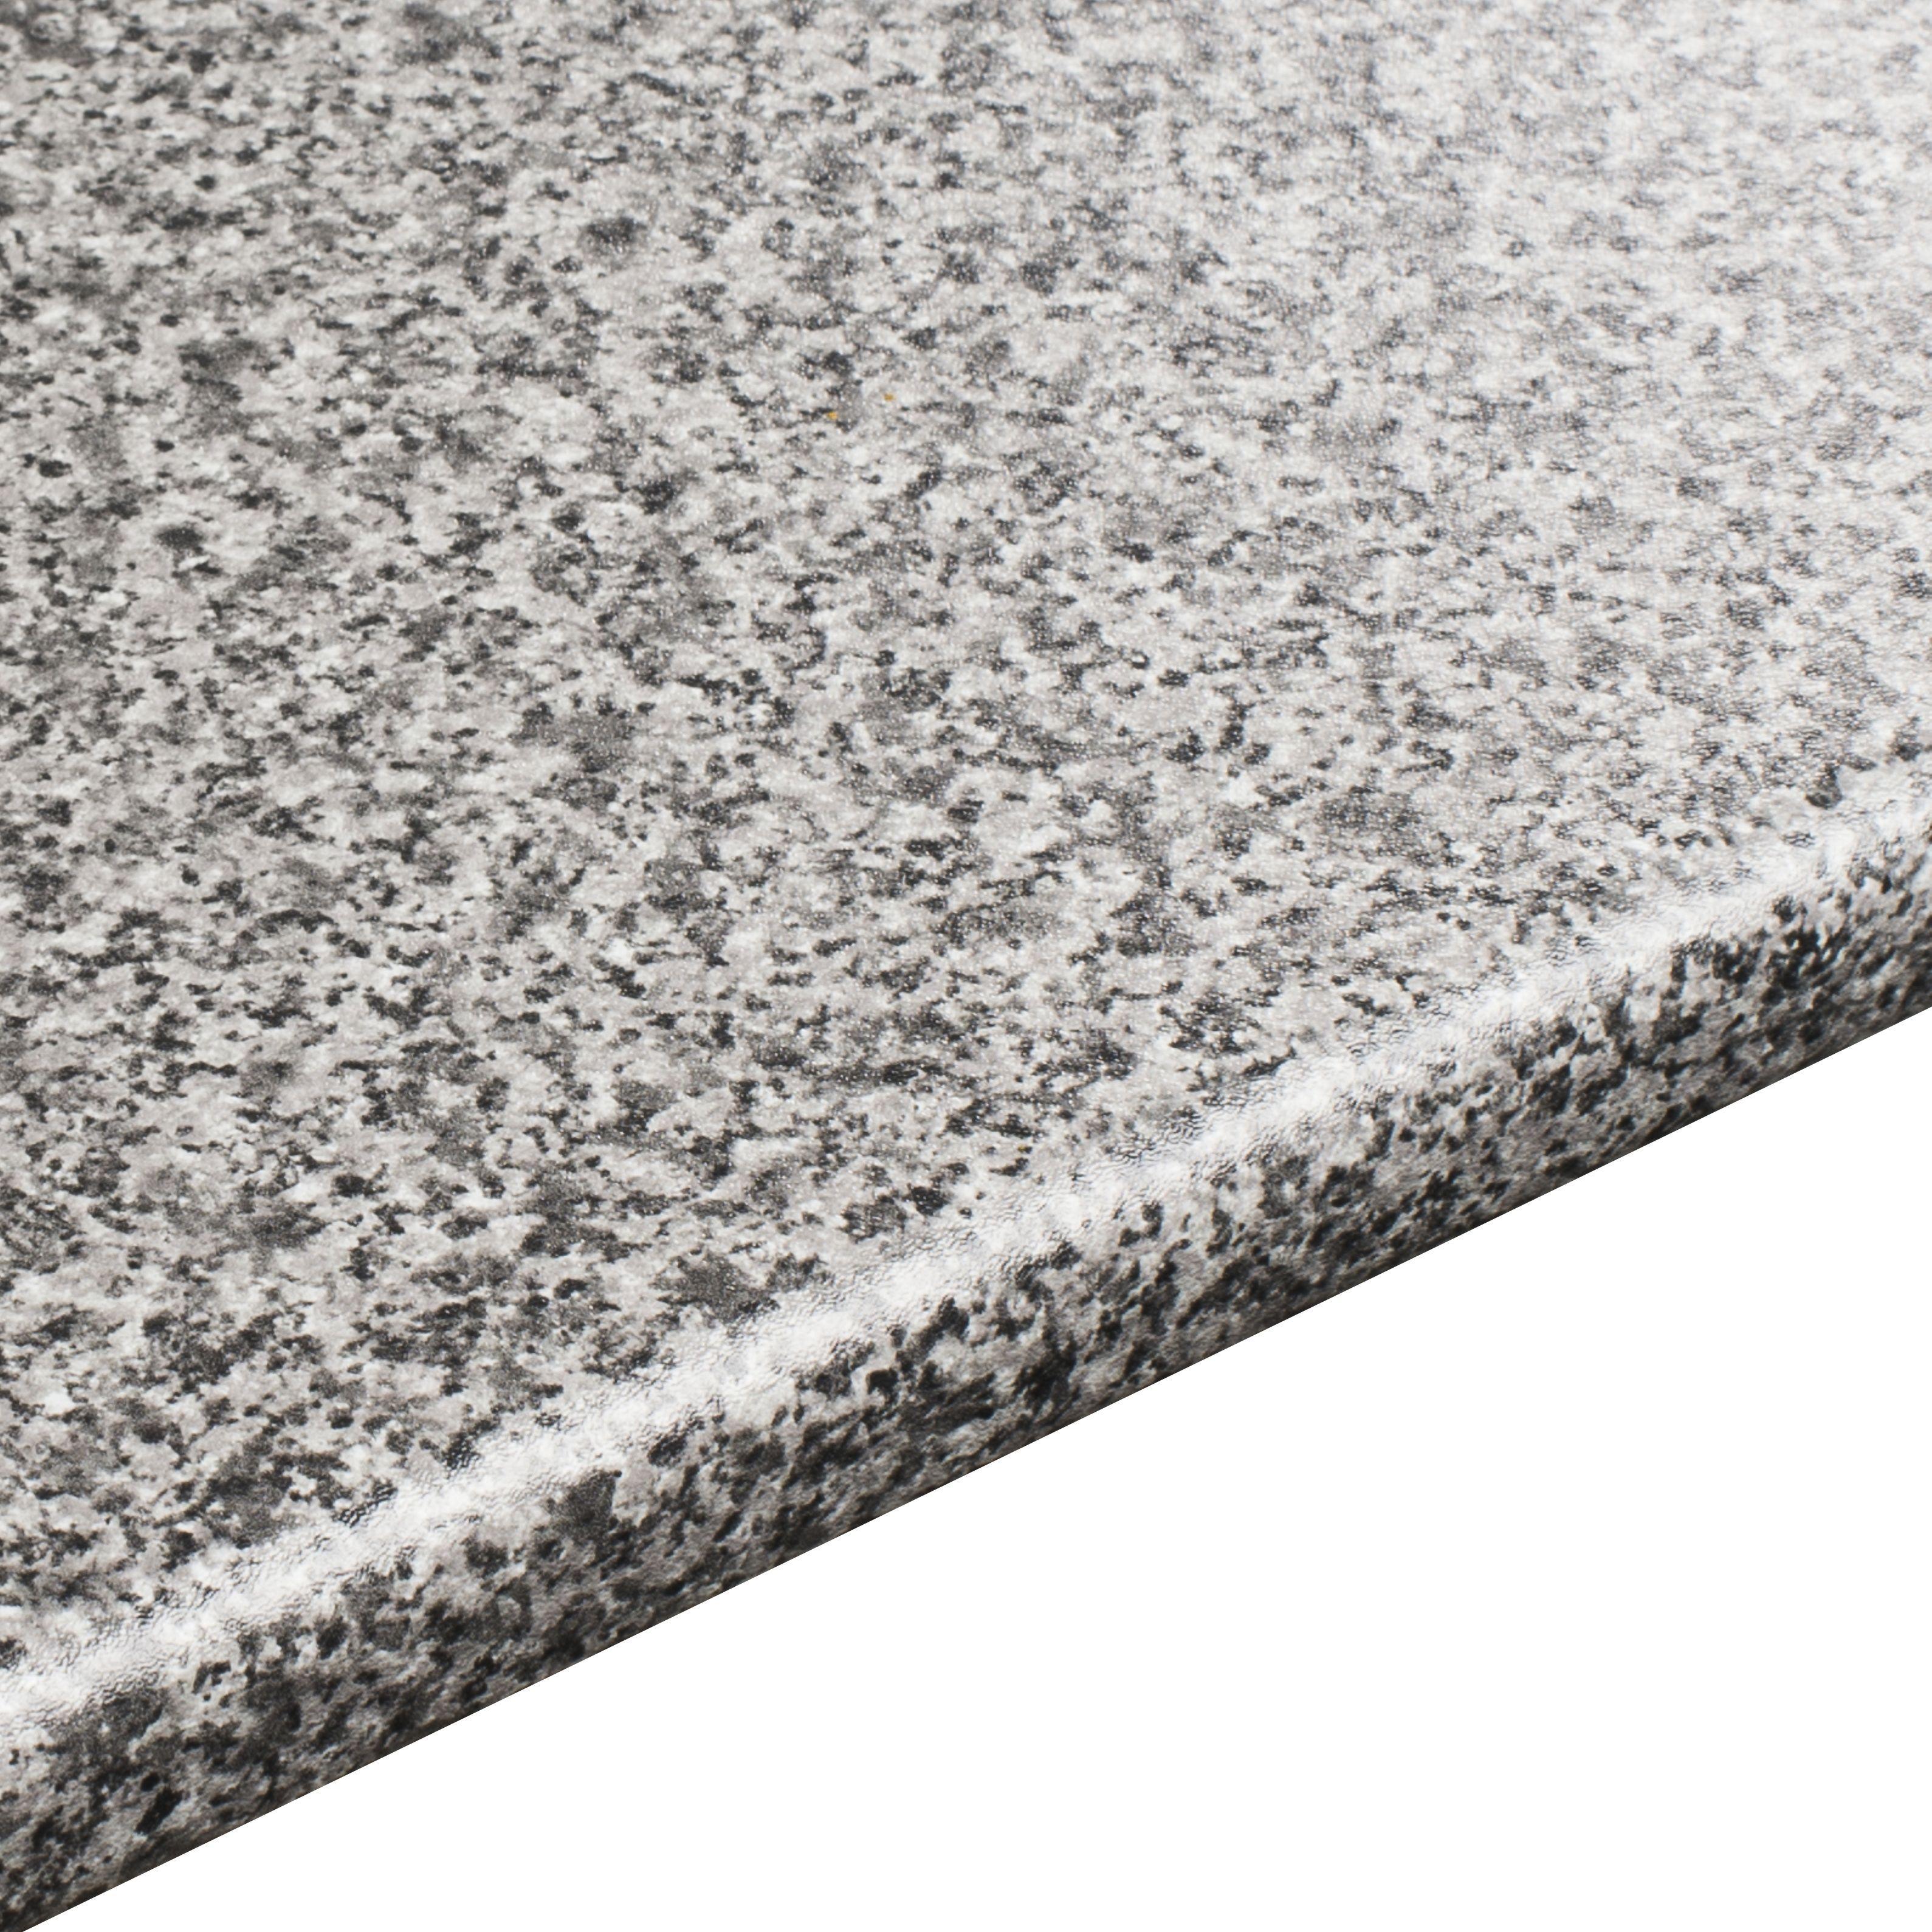 Q Bar And Kitchen: 28mm B&Q Inari Granite Laminate Round Edge Kitchen Worktop